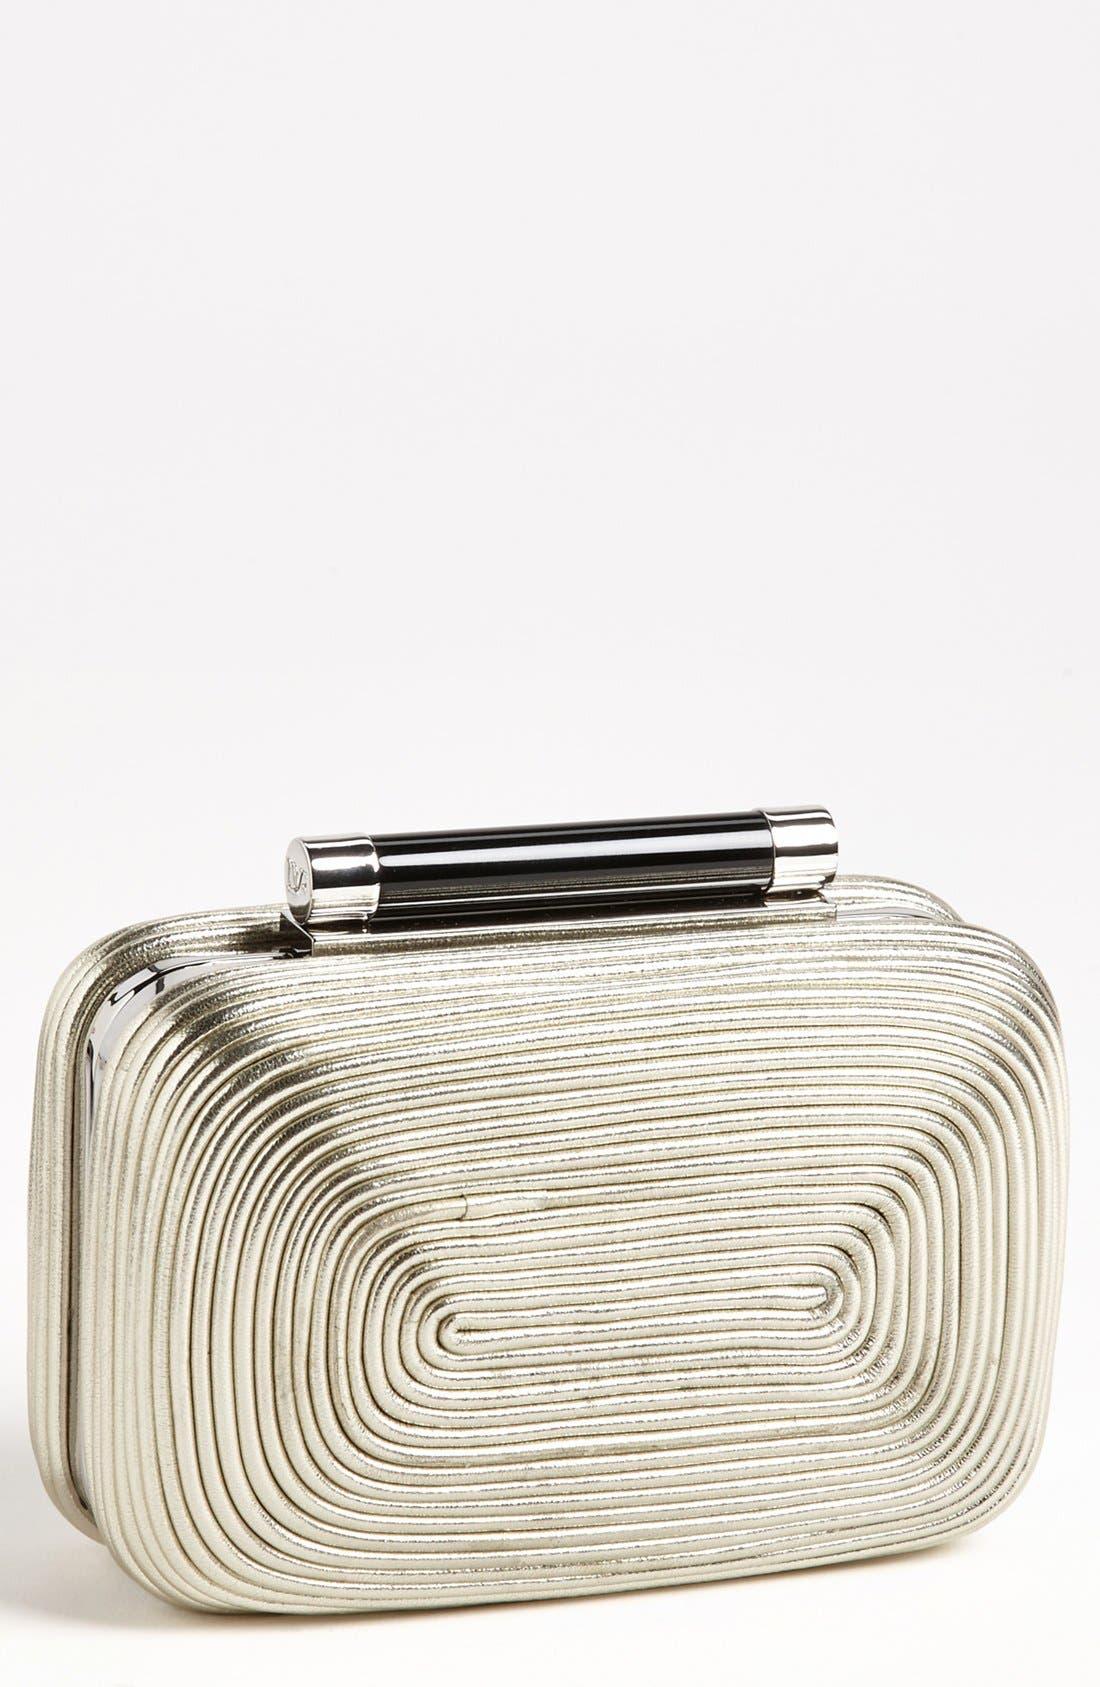 Main Image - Diane von Furstenberg 'Tonda - Small' Passementerie Metallic Clutch